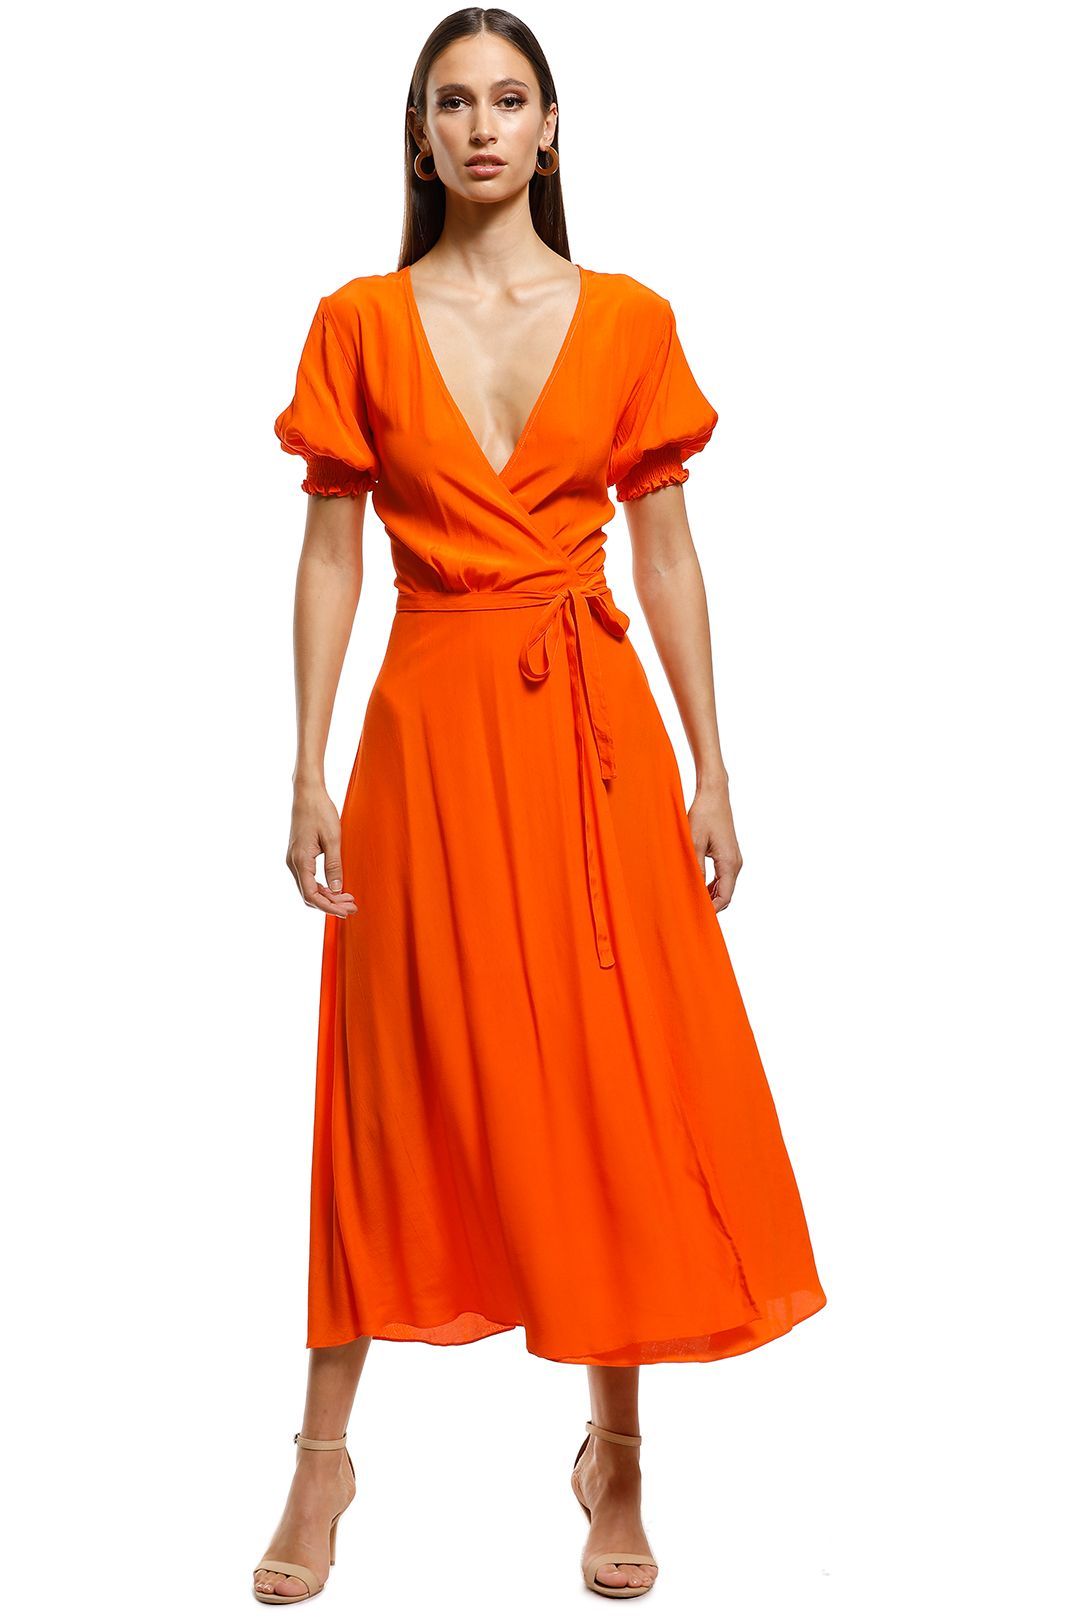 S/W/F - Pounce Dress - Copper - Front